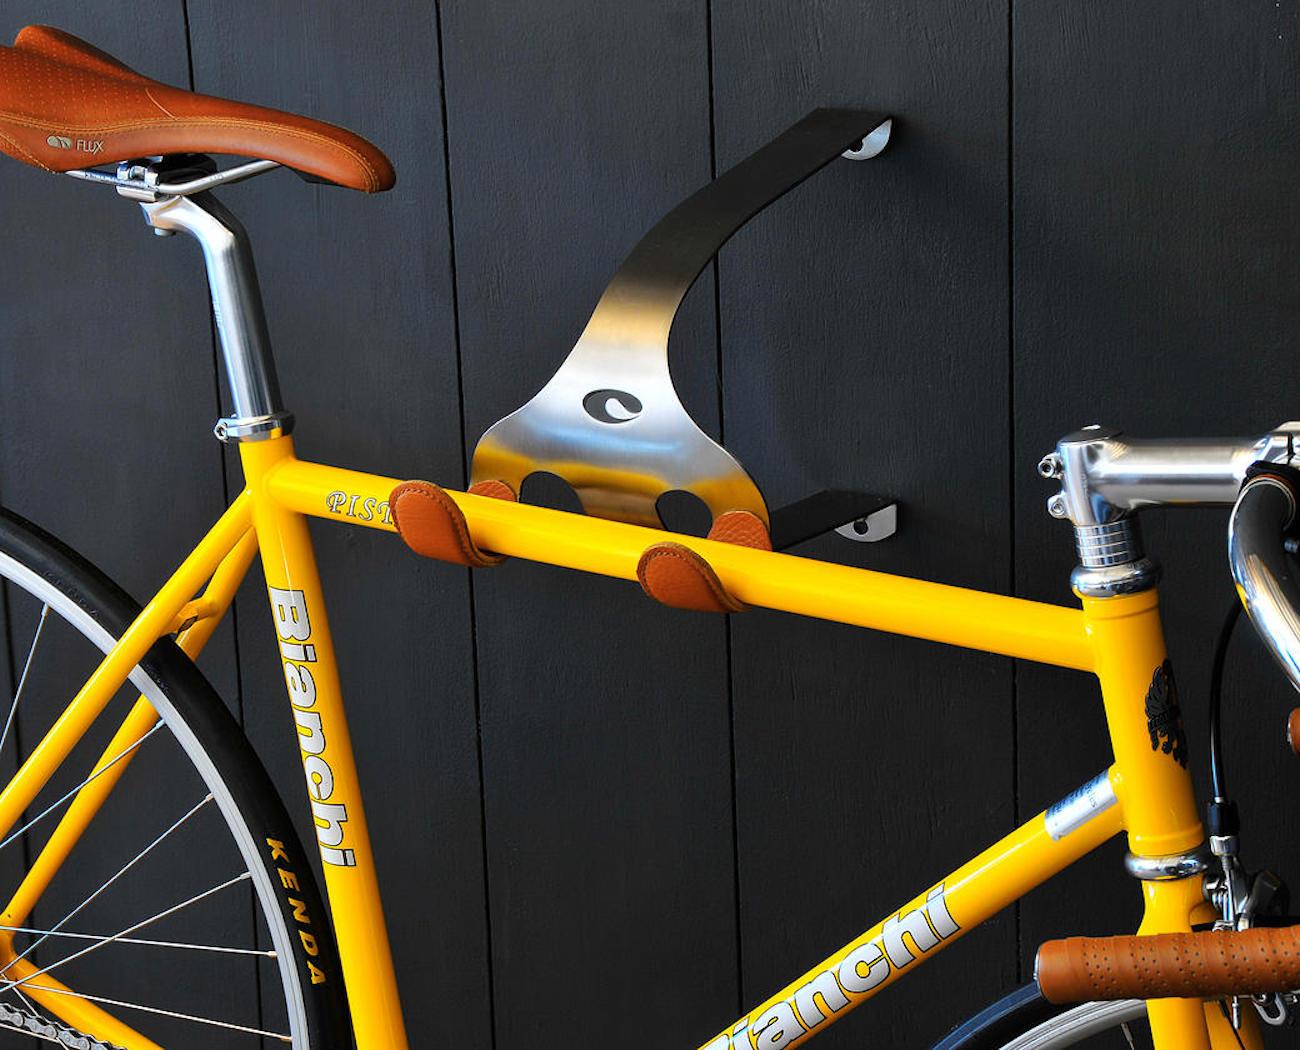 Cactus+Tongue+SSL+Wall+Mounted+Bike+Hanger